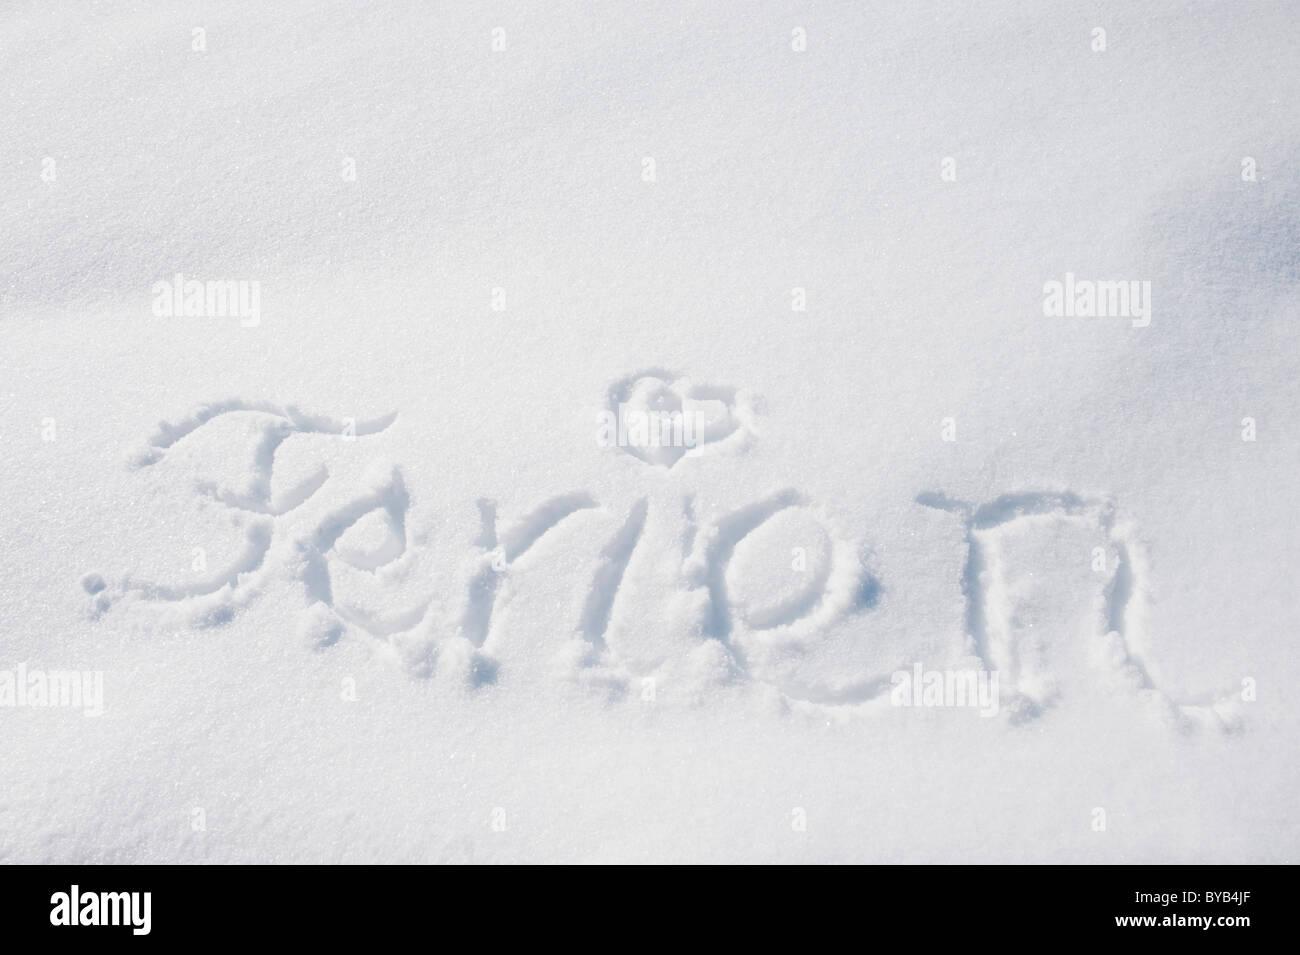 The word Ferien or holiday written in snow, winter, Landshut, Lower Bavaria, Bavaria, Germany, Europe - Stock Image